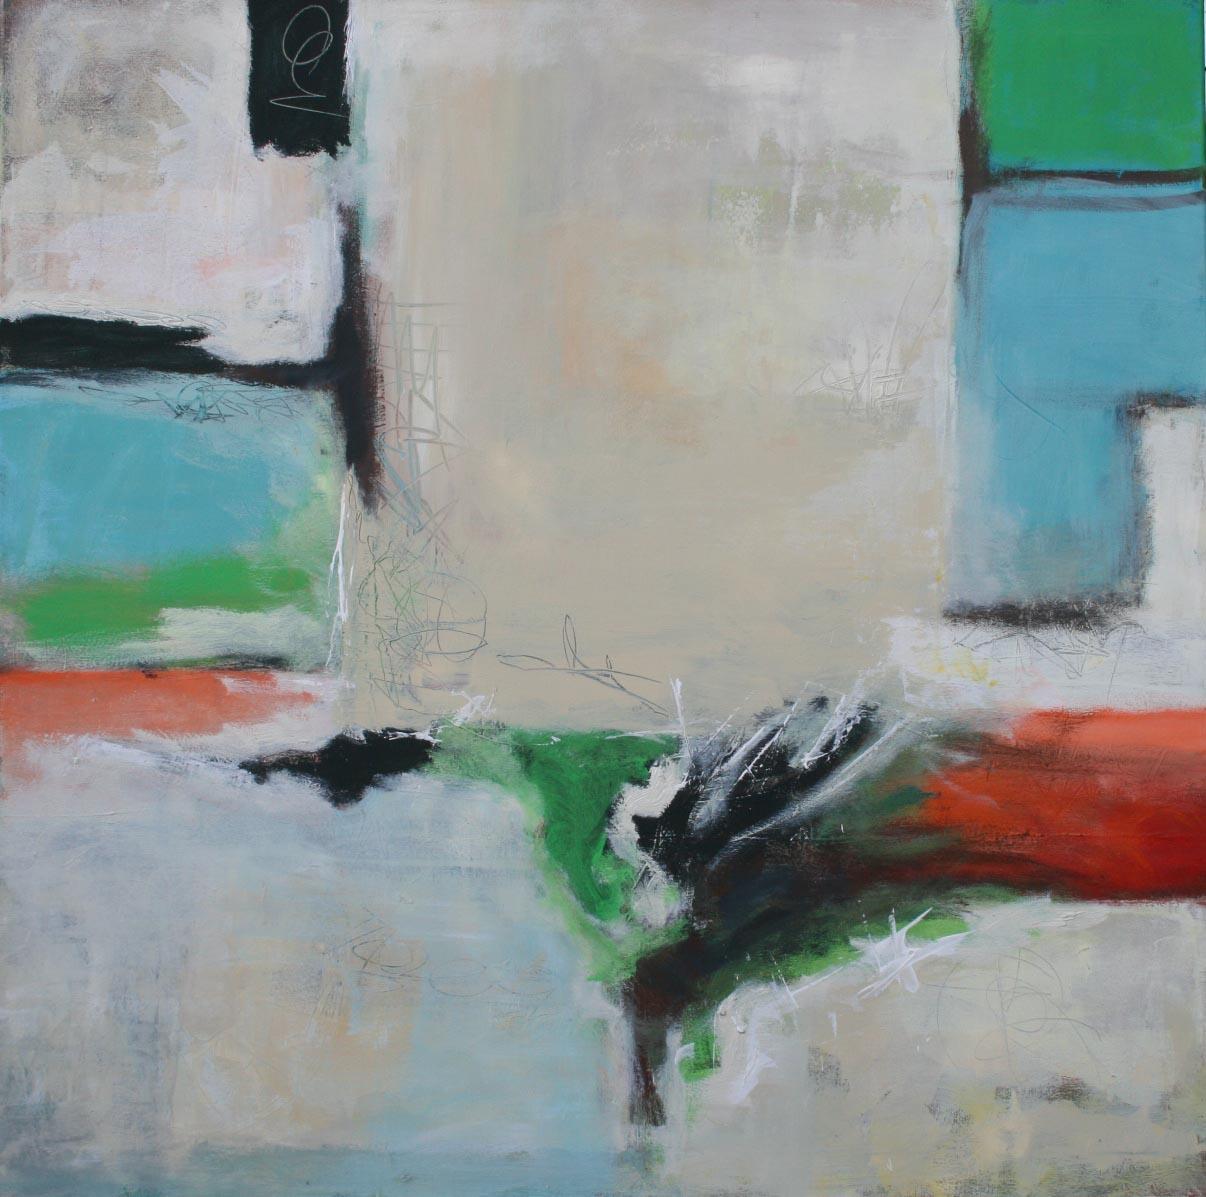 Ohne Titel 1702, Öl und Acryl auf Leinwand, 100 x 100 cm